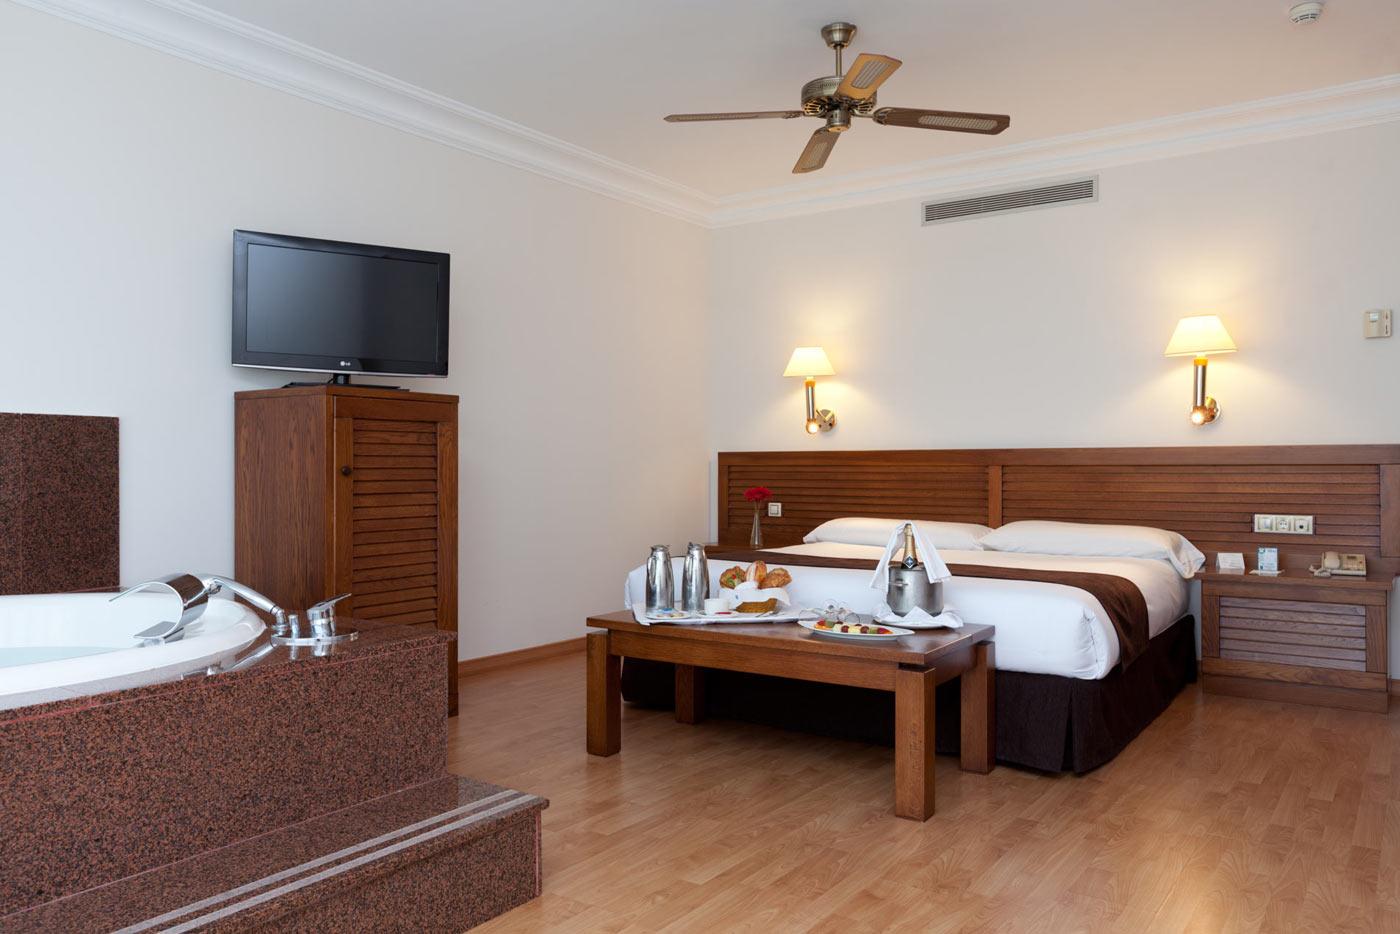 Marbella Bedroom Furniture Accommodation In Marbella Senator Marbella Spa Hotel Official